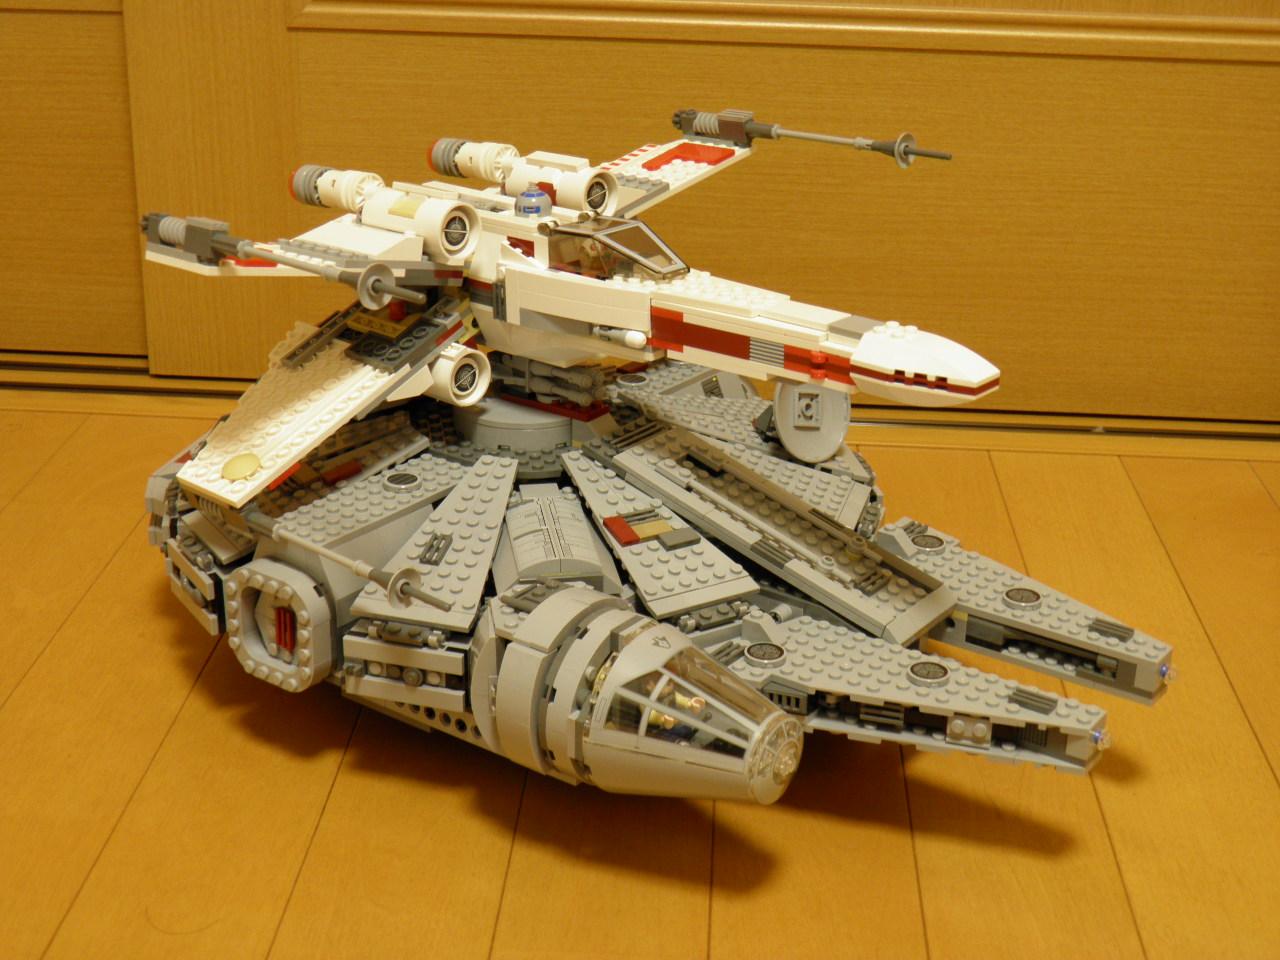 LEGO Xwing 034